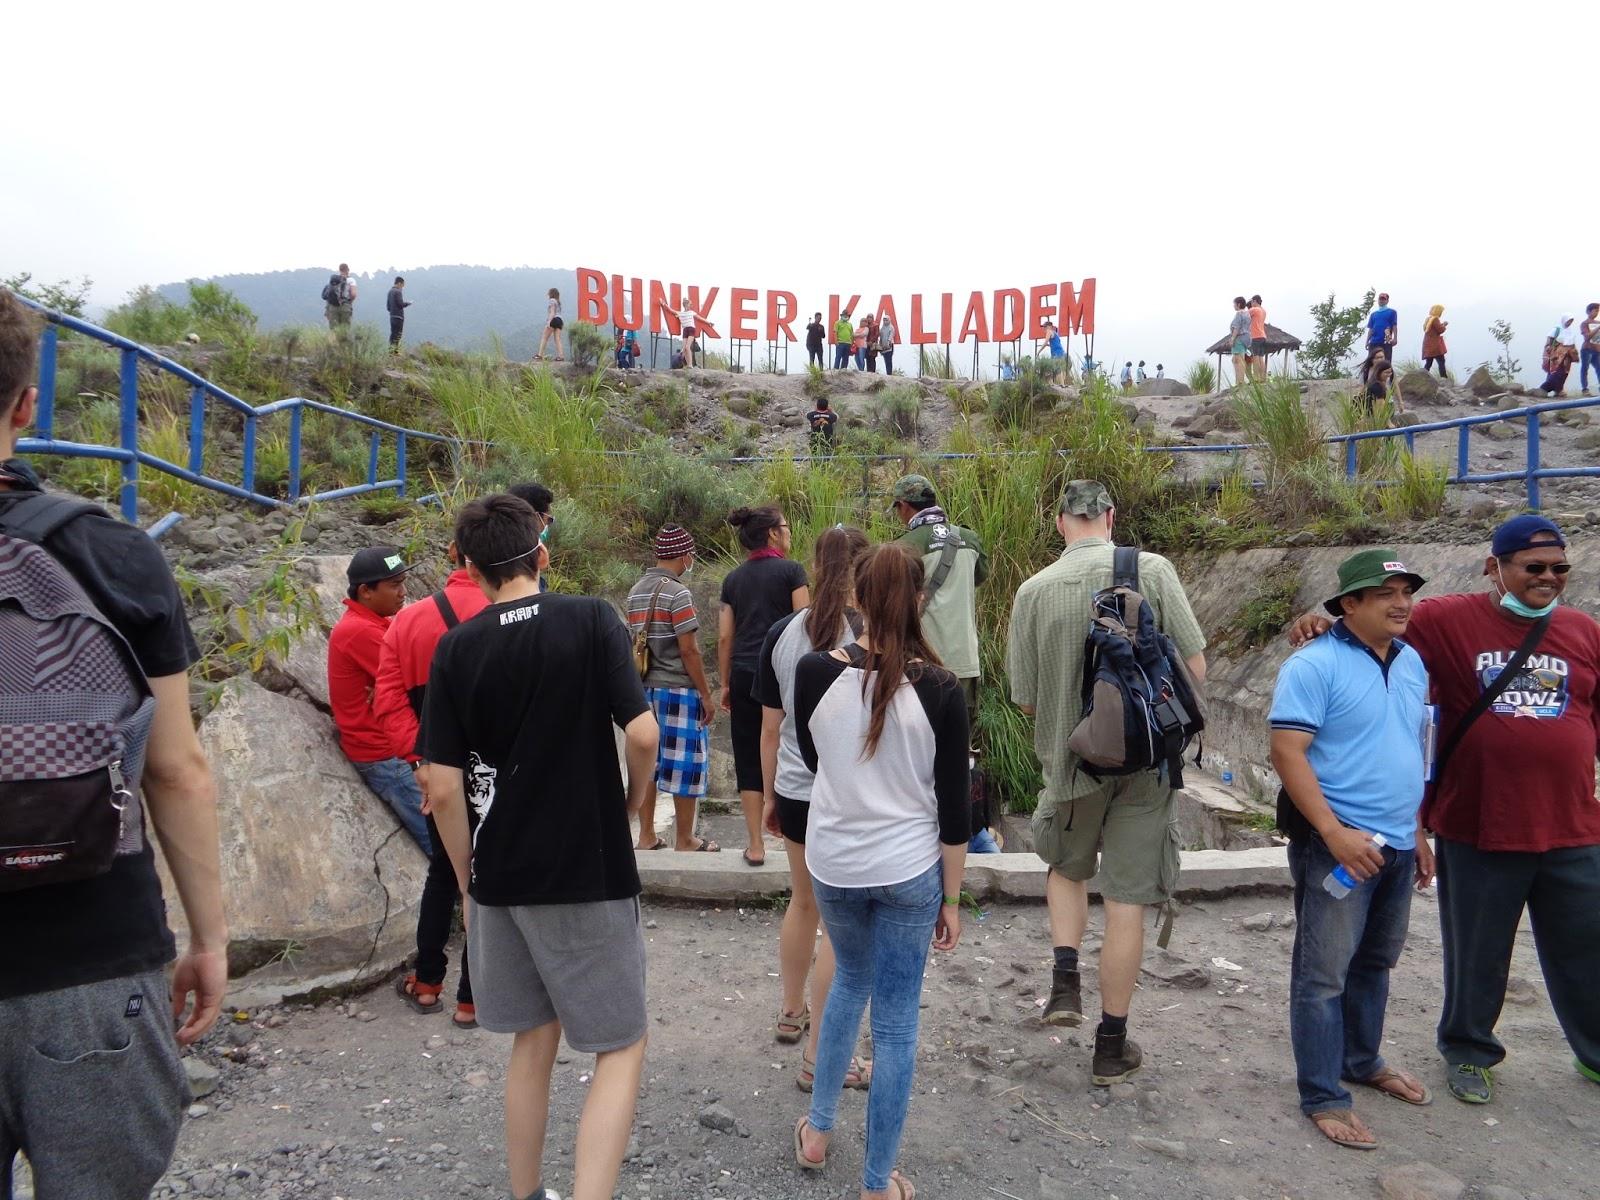 Bungker Kaliadem Yogyakarta Bakpia Mutiara Jogja Bunker Kab Sleman